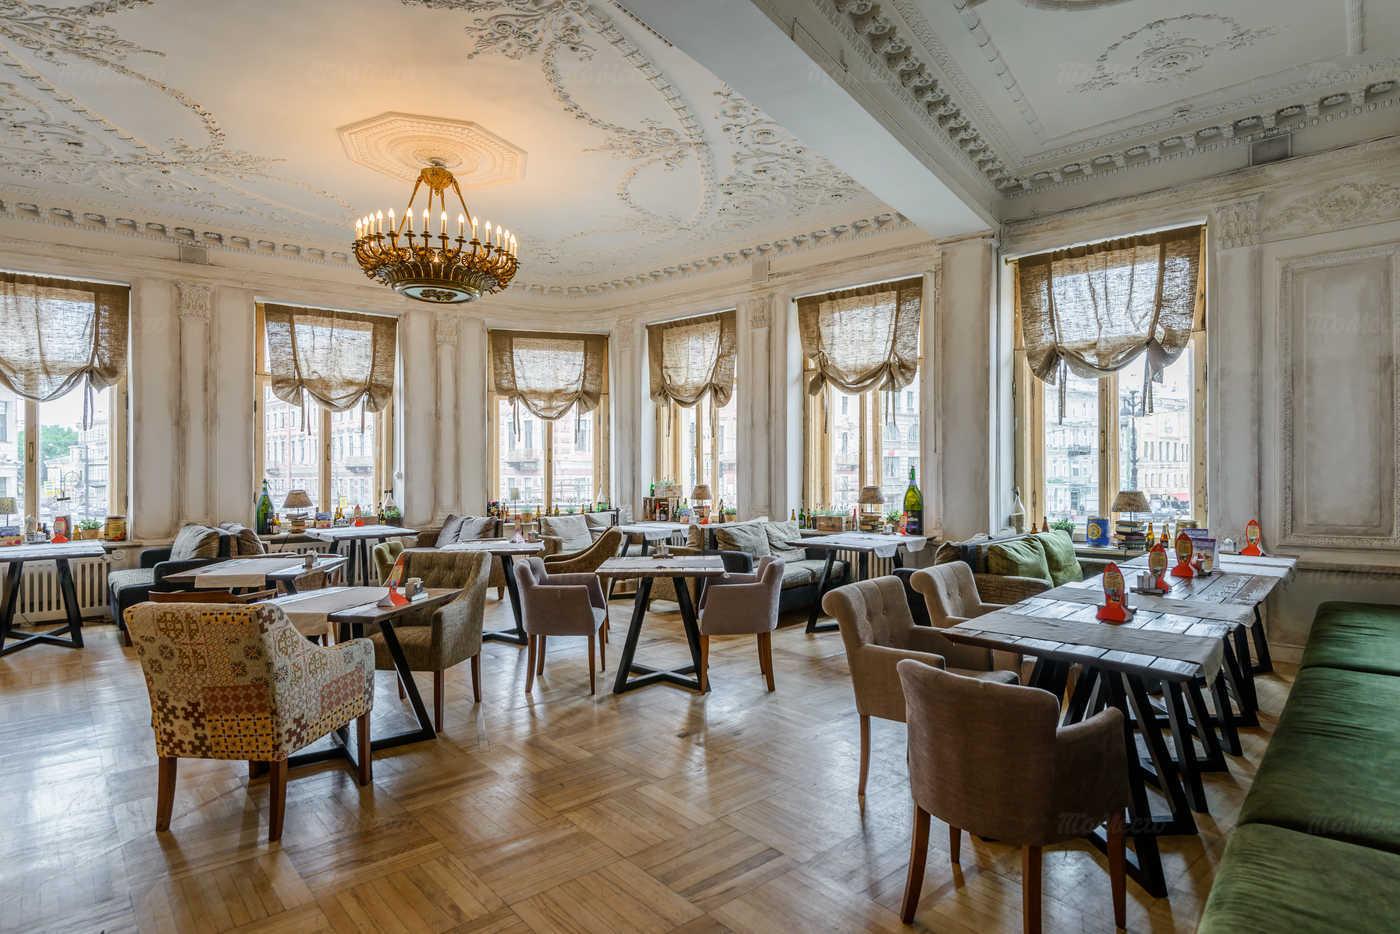 Ресторан Шато Винтаж (Chateau Vintage) на Невском проспекте